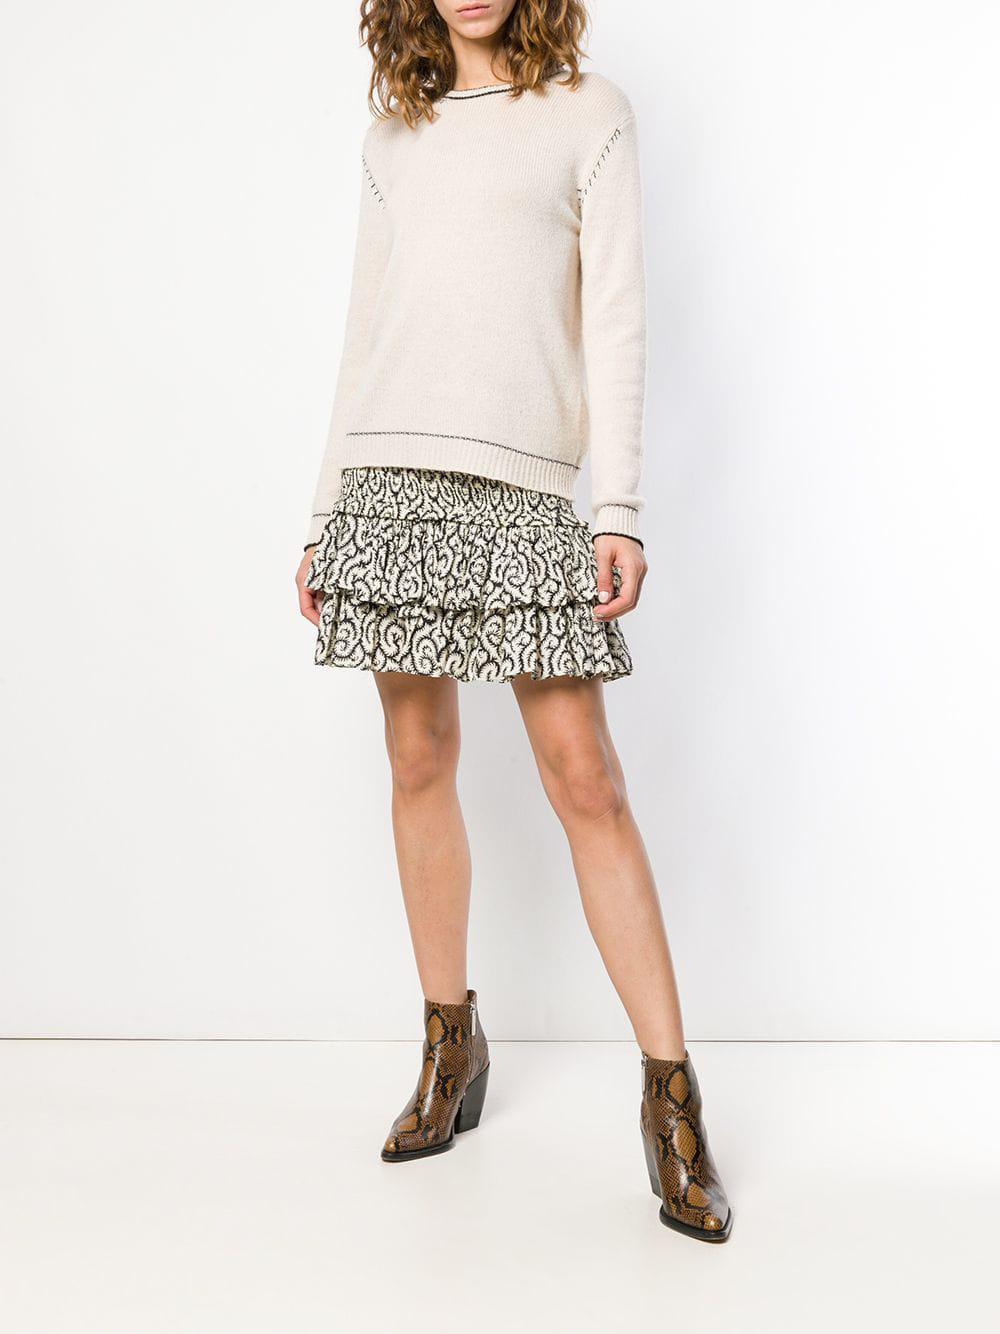 bb383de43 Lyst - Étoile Isabel Marant Ruffle Tiered Mini Skirt in White